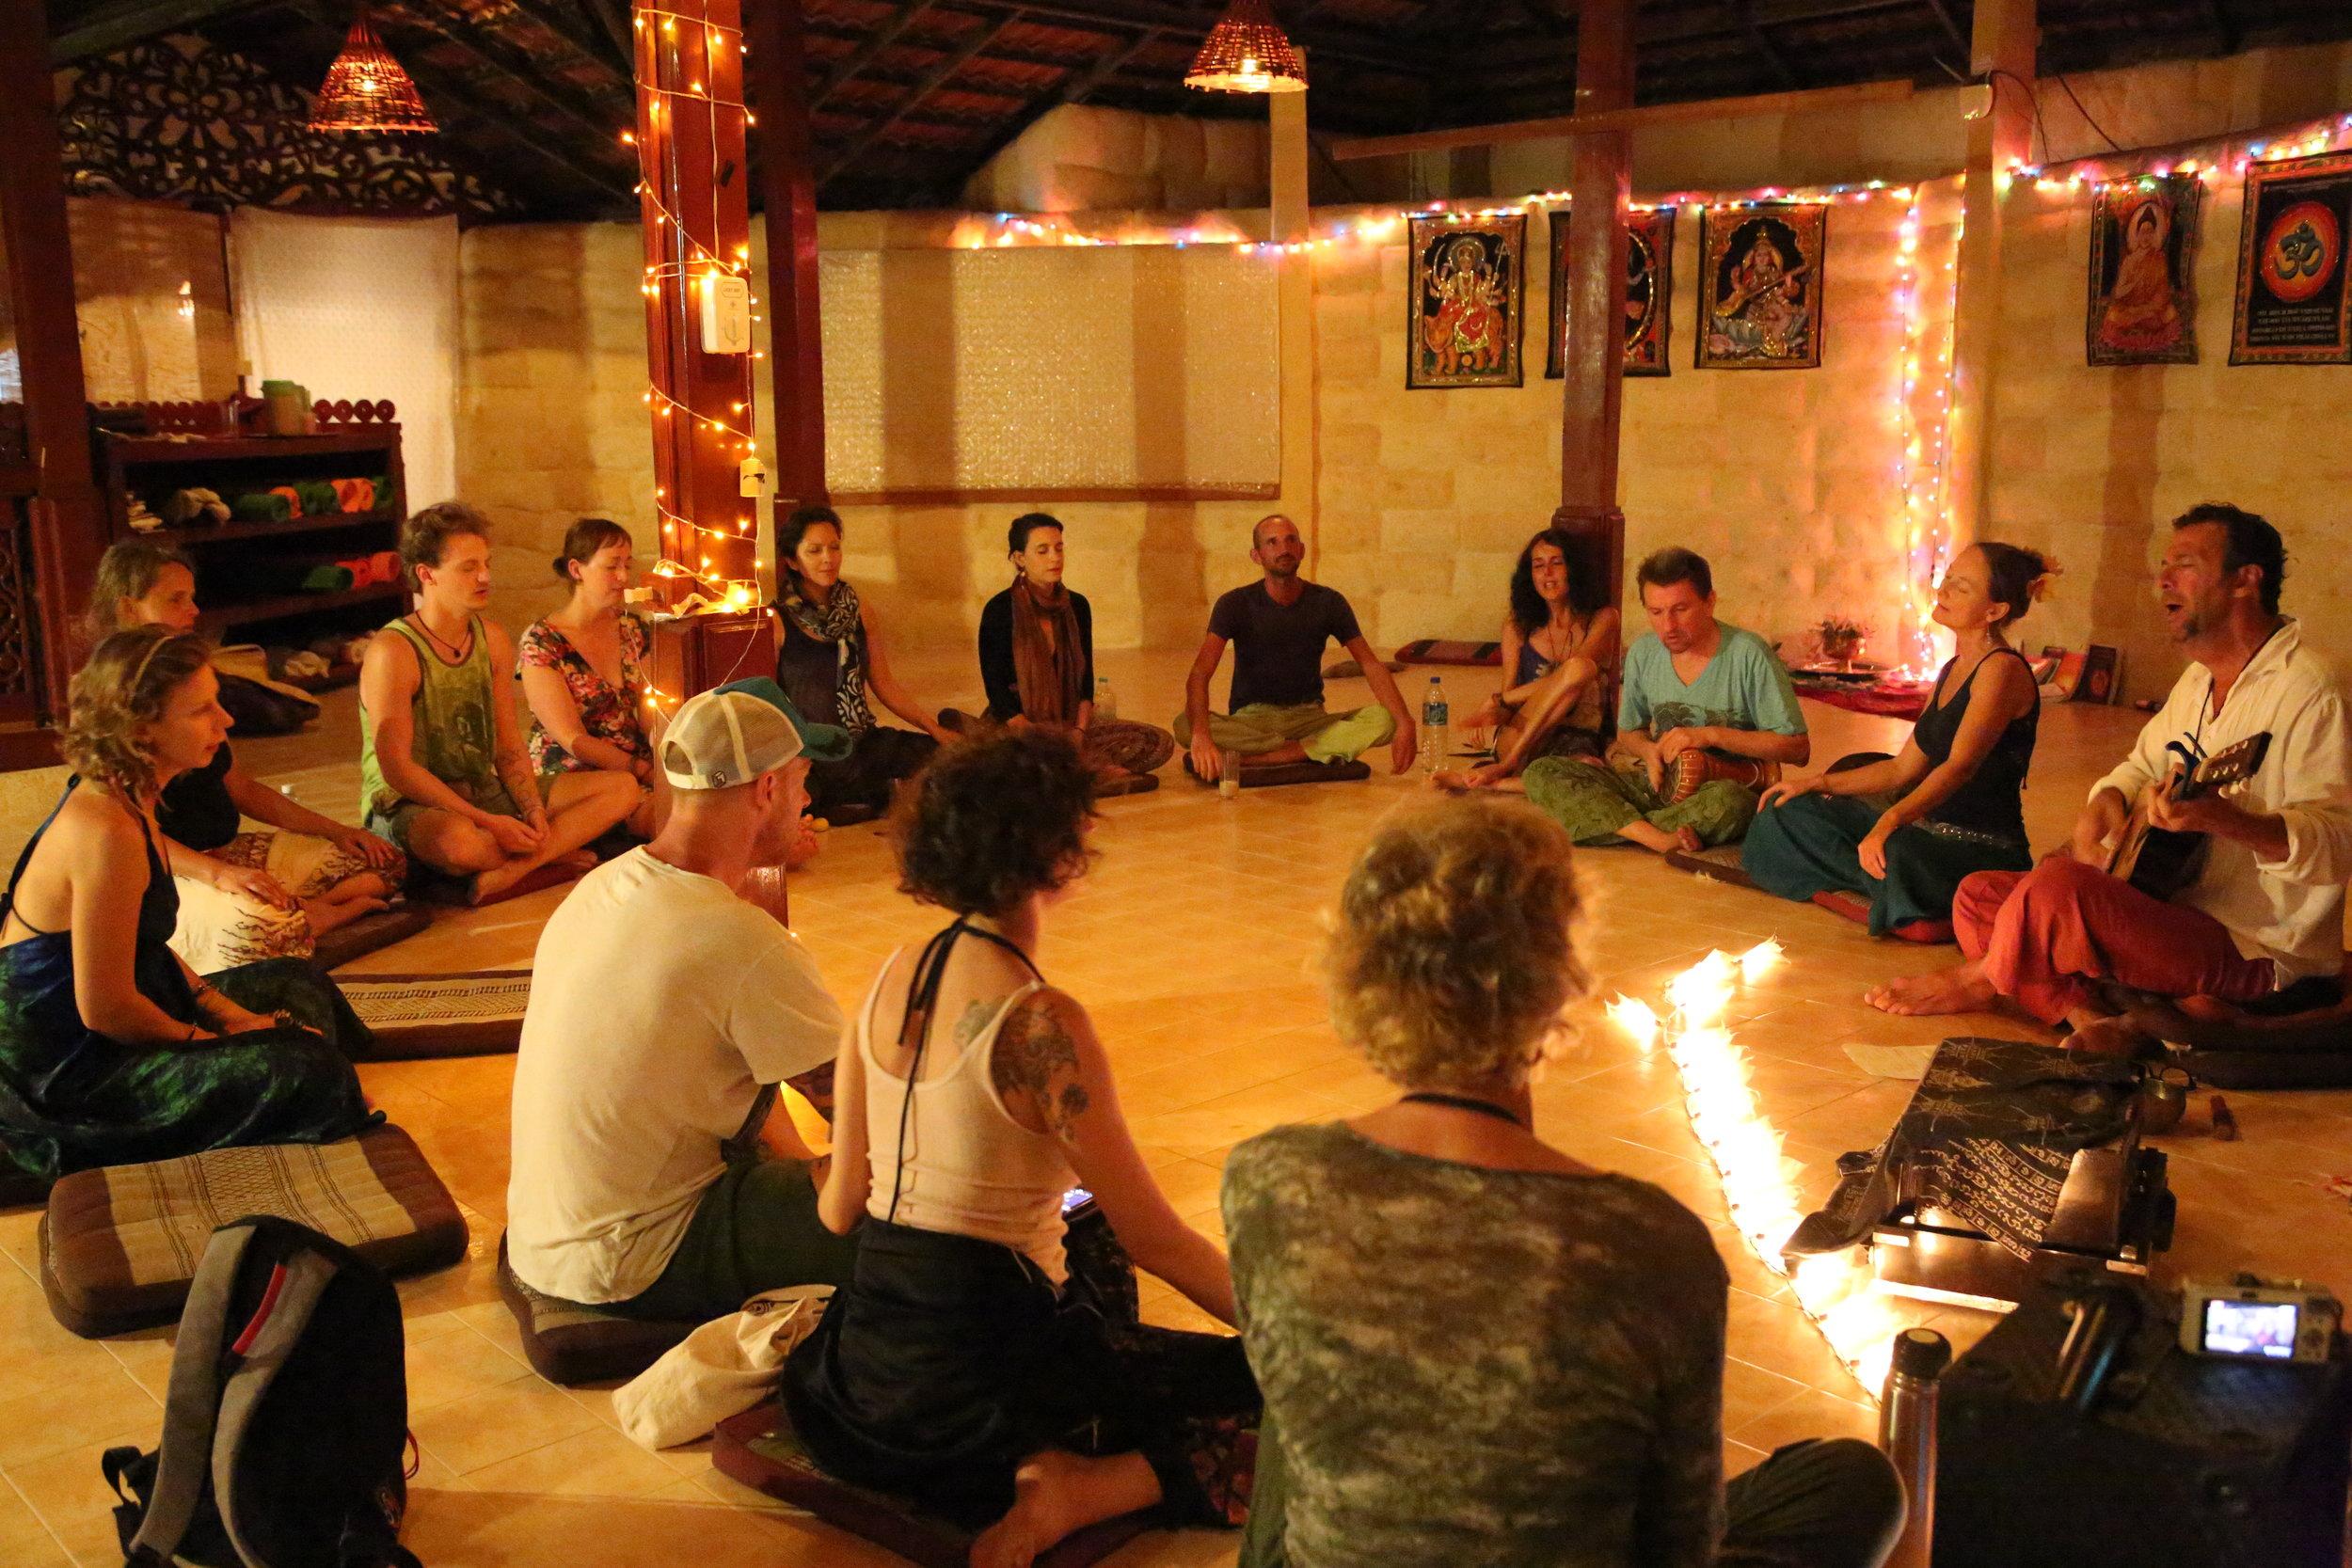 Tantra-Yoga-Retreat-Jessica-Vilches-Yoga-Thailand-Tantra-Ayurveda-Retreat-Bhakti-Bali-Ibiza-Mexico-Guatemala-Costa-Rica-Peru.JPG